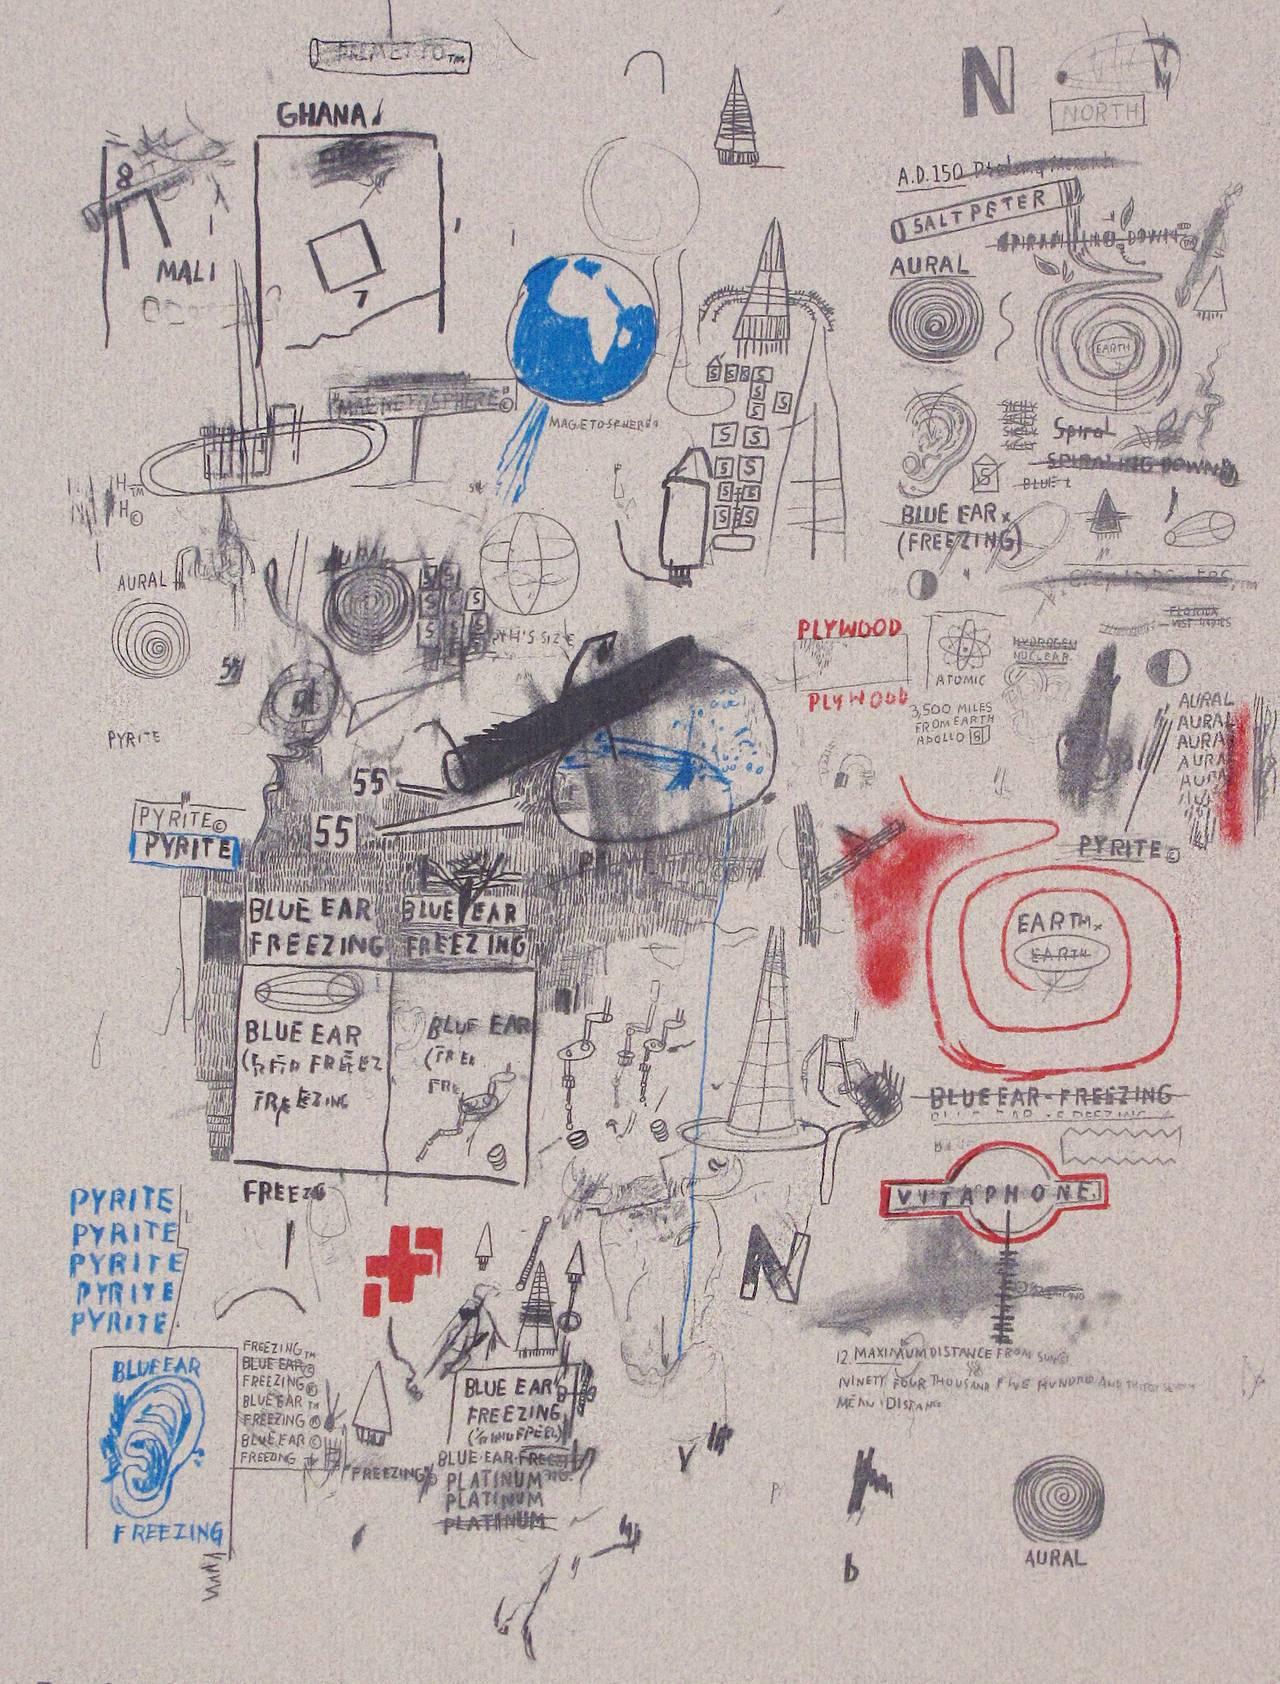 Untitled (Area), 1984, by Jean Michel Basquiat